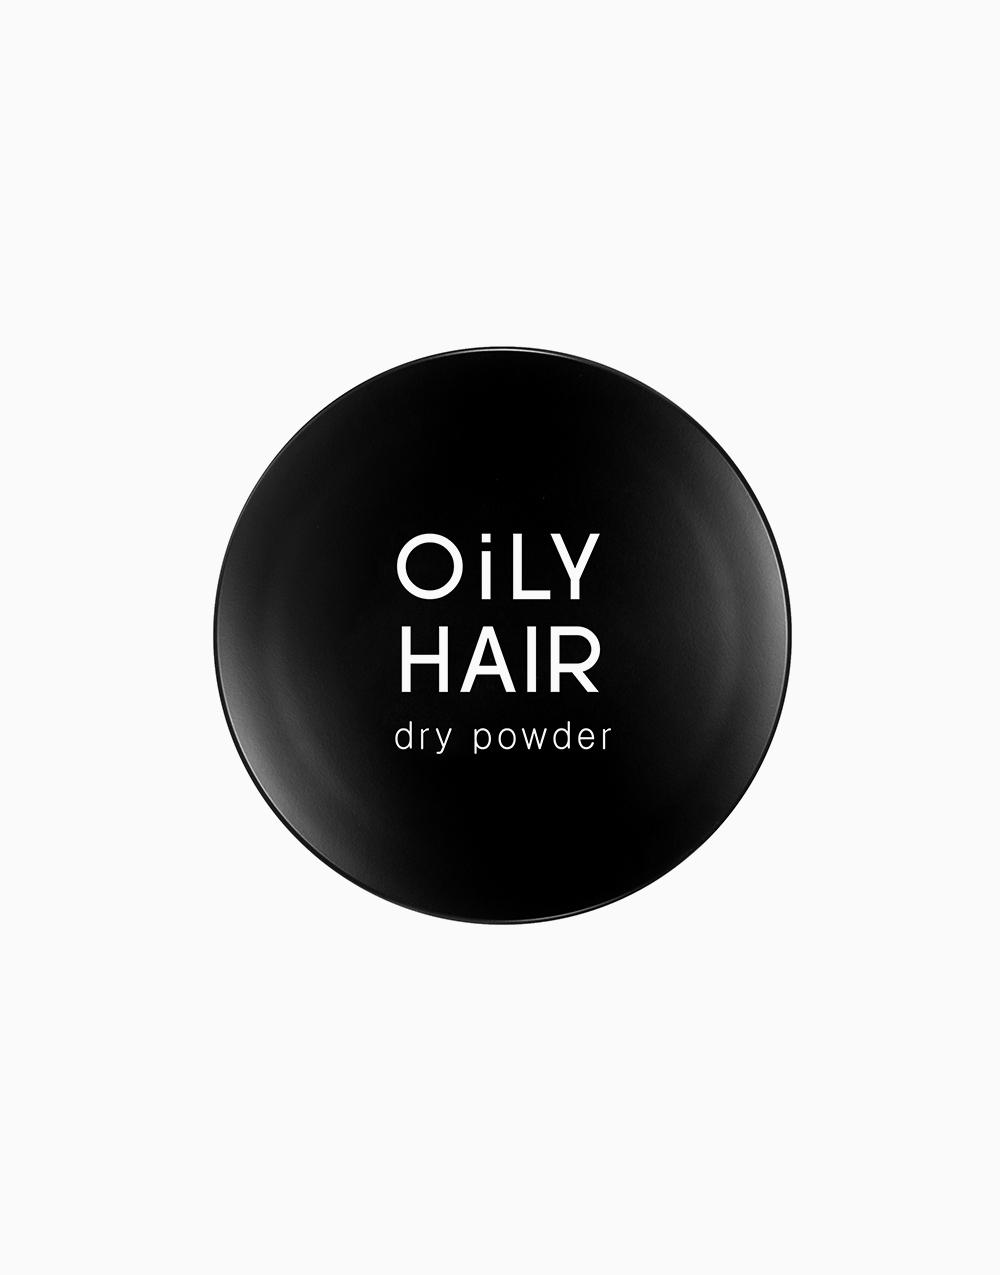 Oily Hair Dry Powder by A'pieu